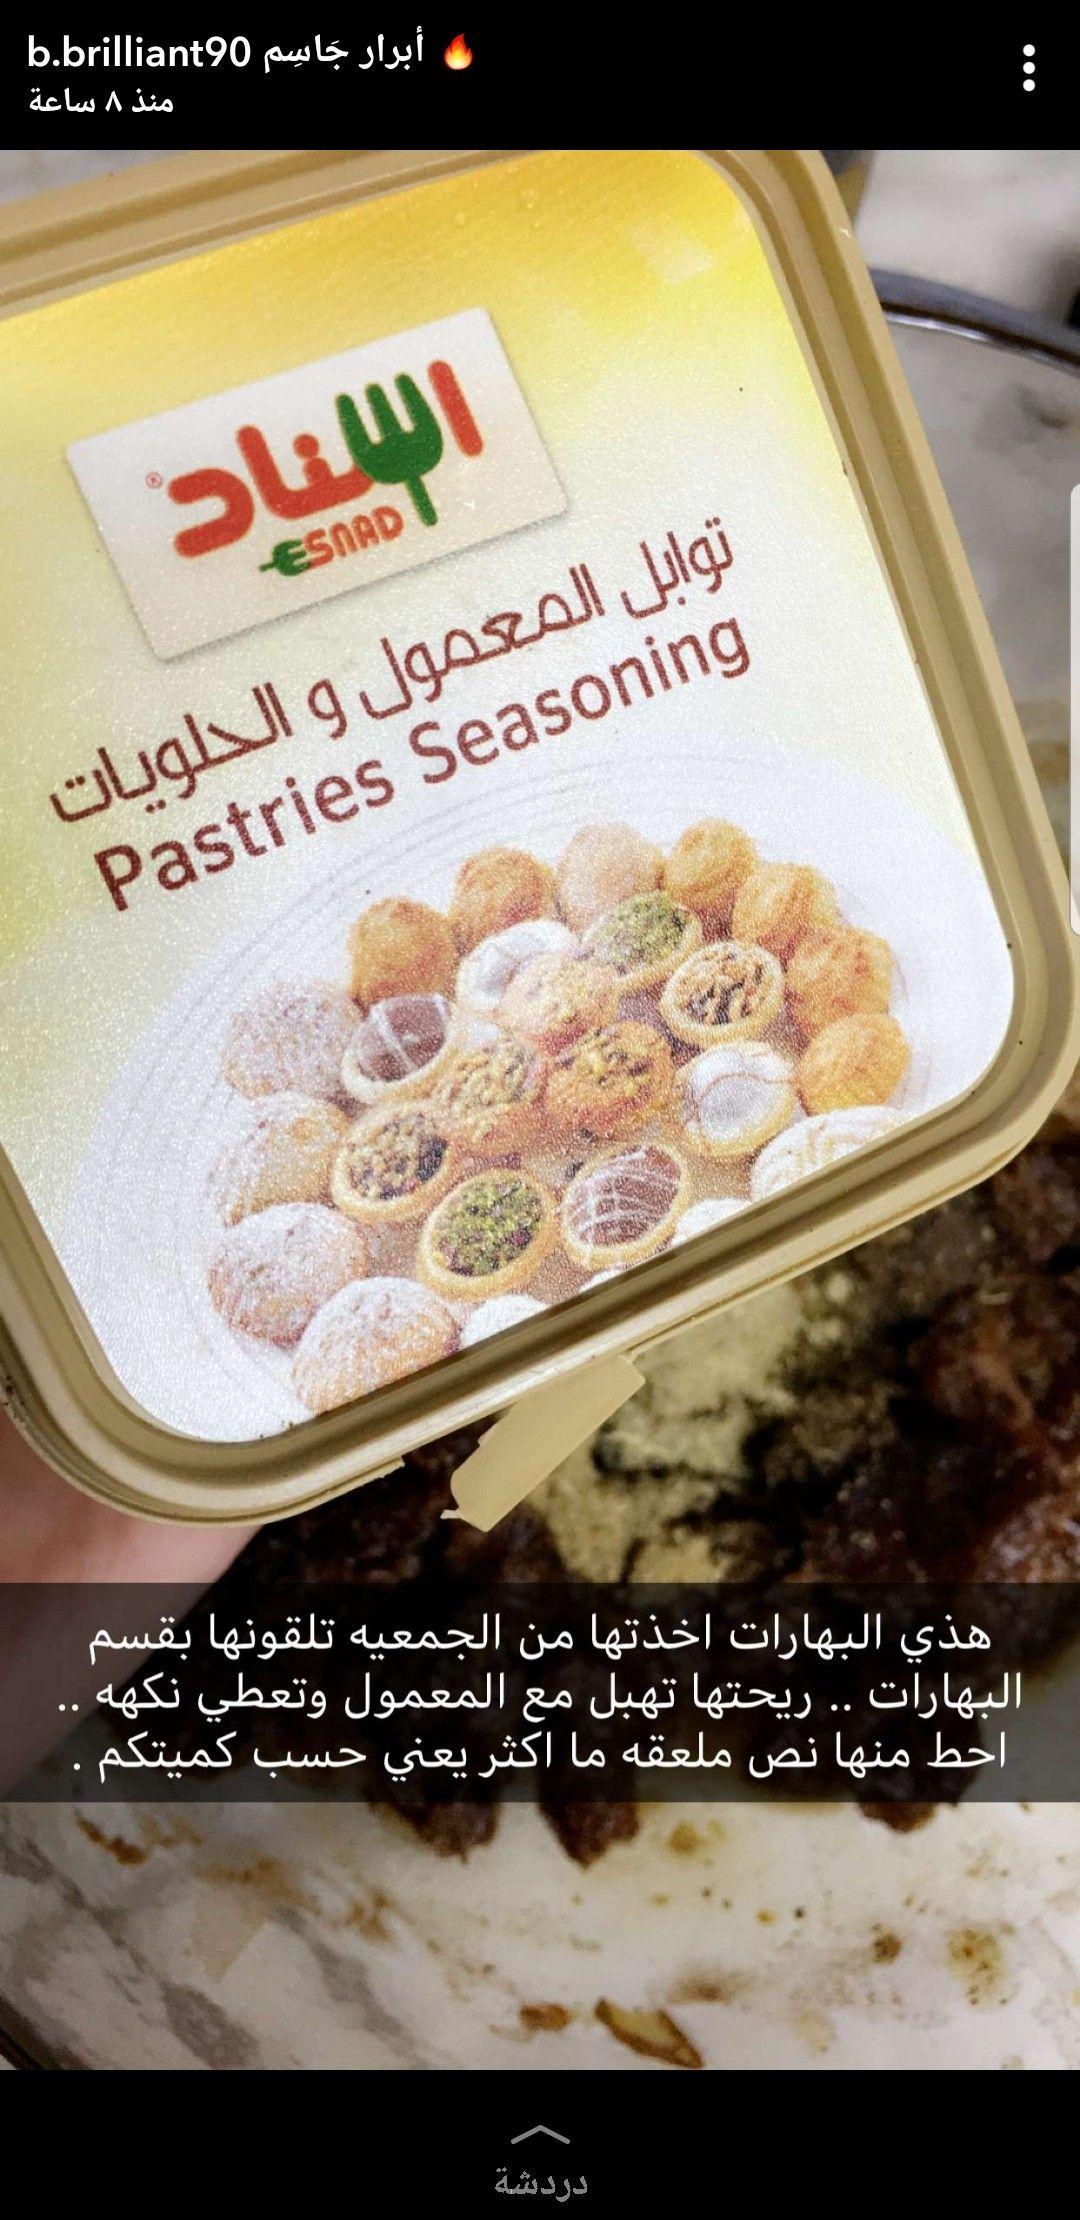 Pin By Nonosaad4 On حلويات Food Pastry Bread